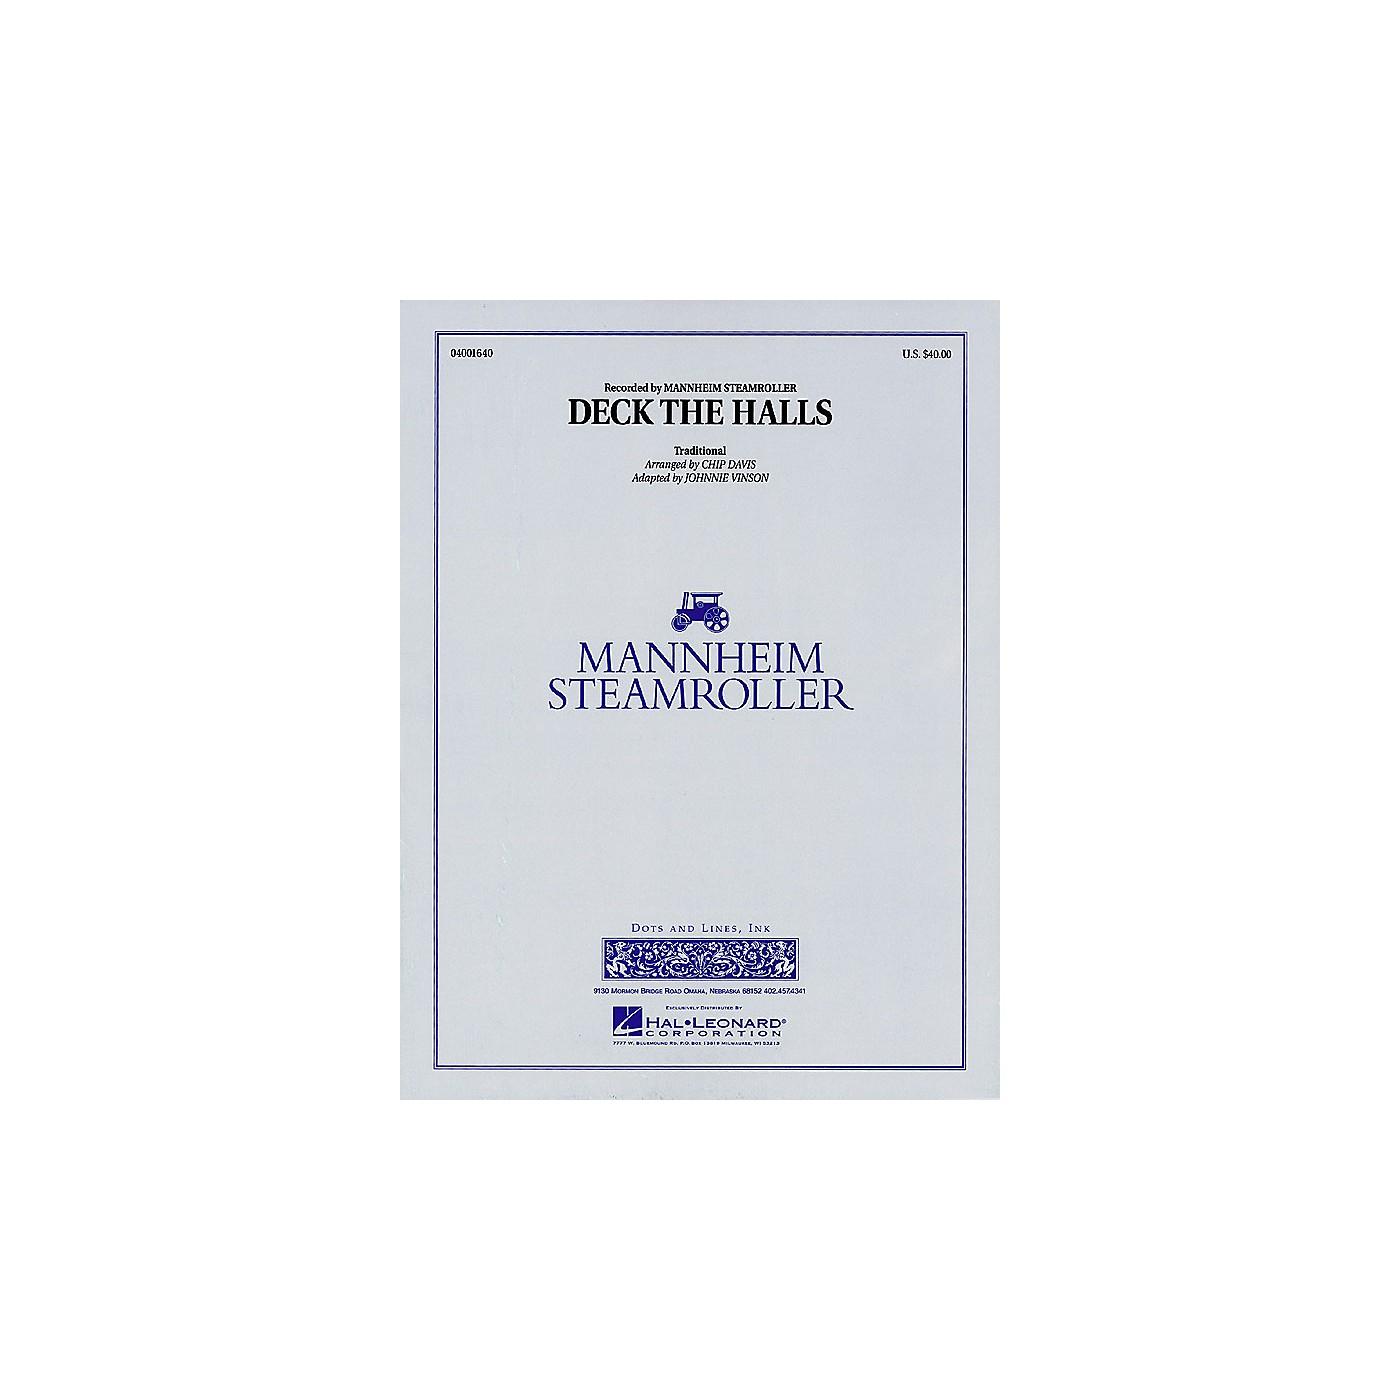 Hal Leonard Deck the Halls (Easy Version) Concert Band Level 2 by Mannheim Steamroller Arranged by Johnnie Vinson thumbnail